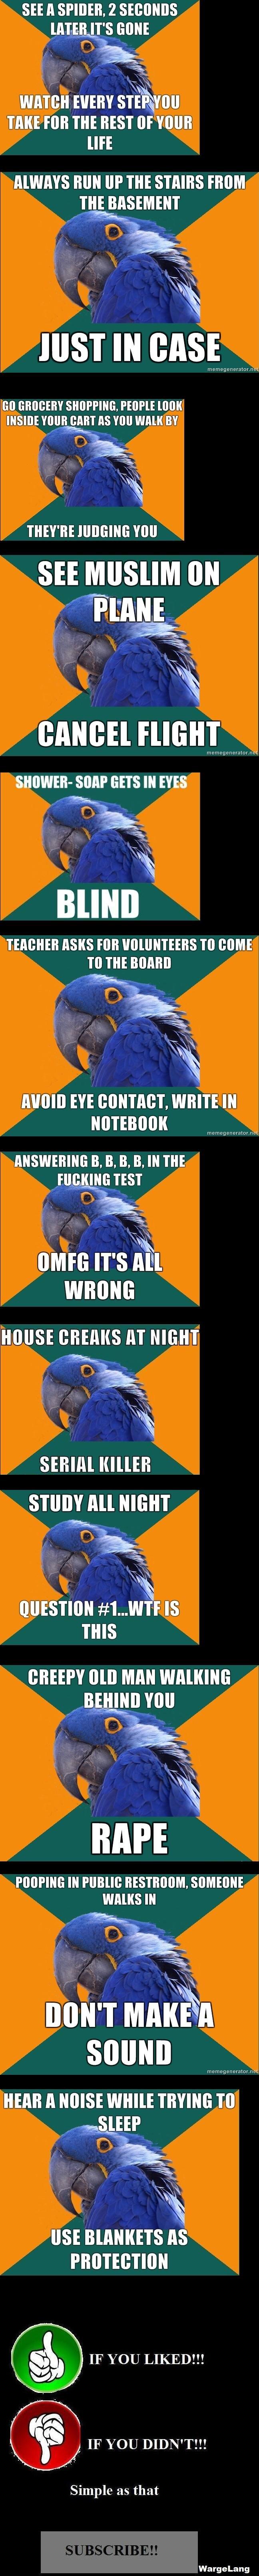 Paranoid Parrot Compilation!. View/Laugh = VOTE!<br /> 100 Thumbs = Number 2!<br /> Paranoid Parrot Compilation 2! - /funny_pictures/1351864/Paranoi Paranoid Parrot compilation lol funny